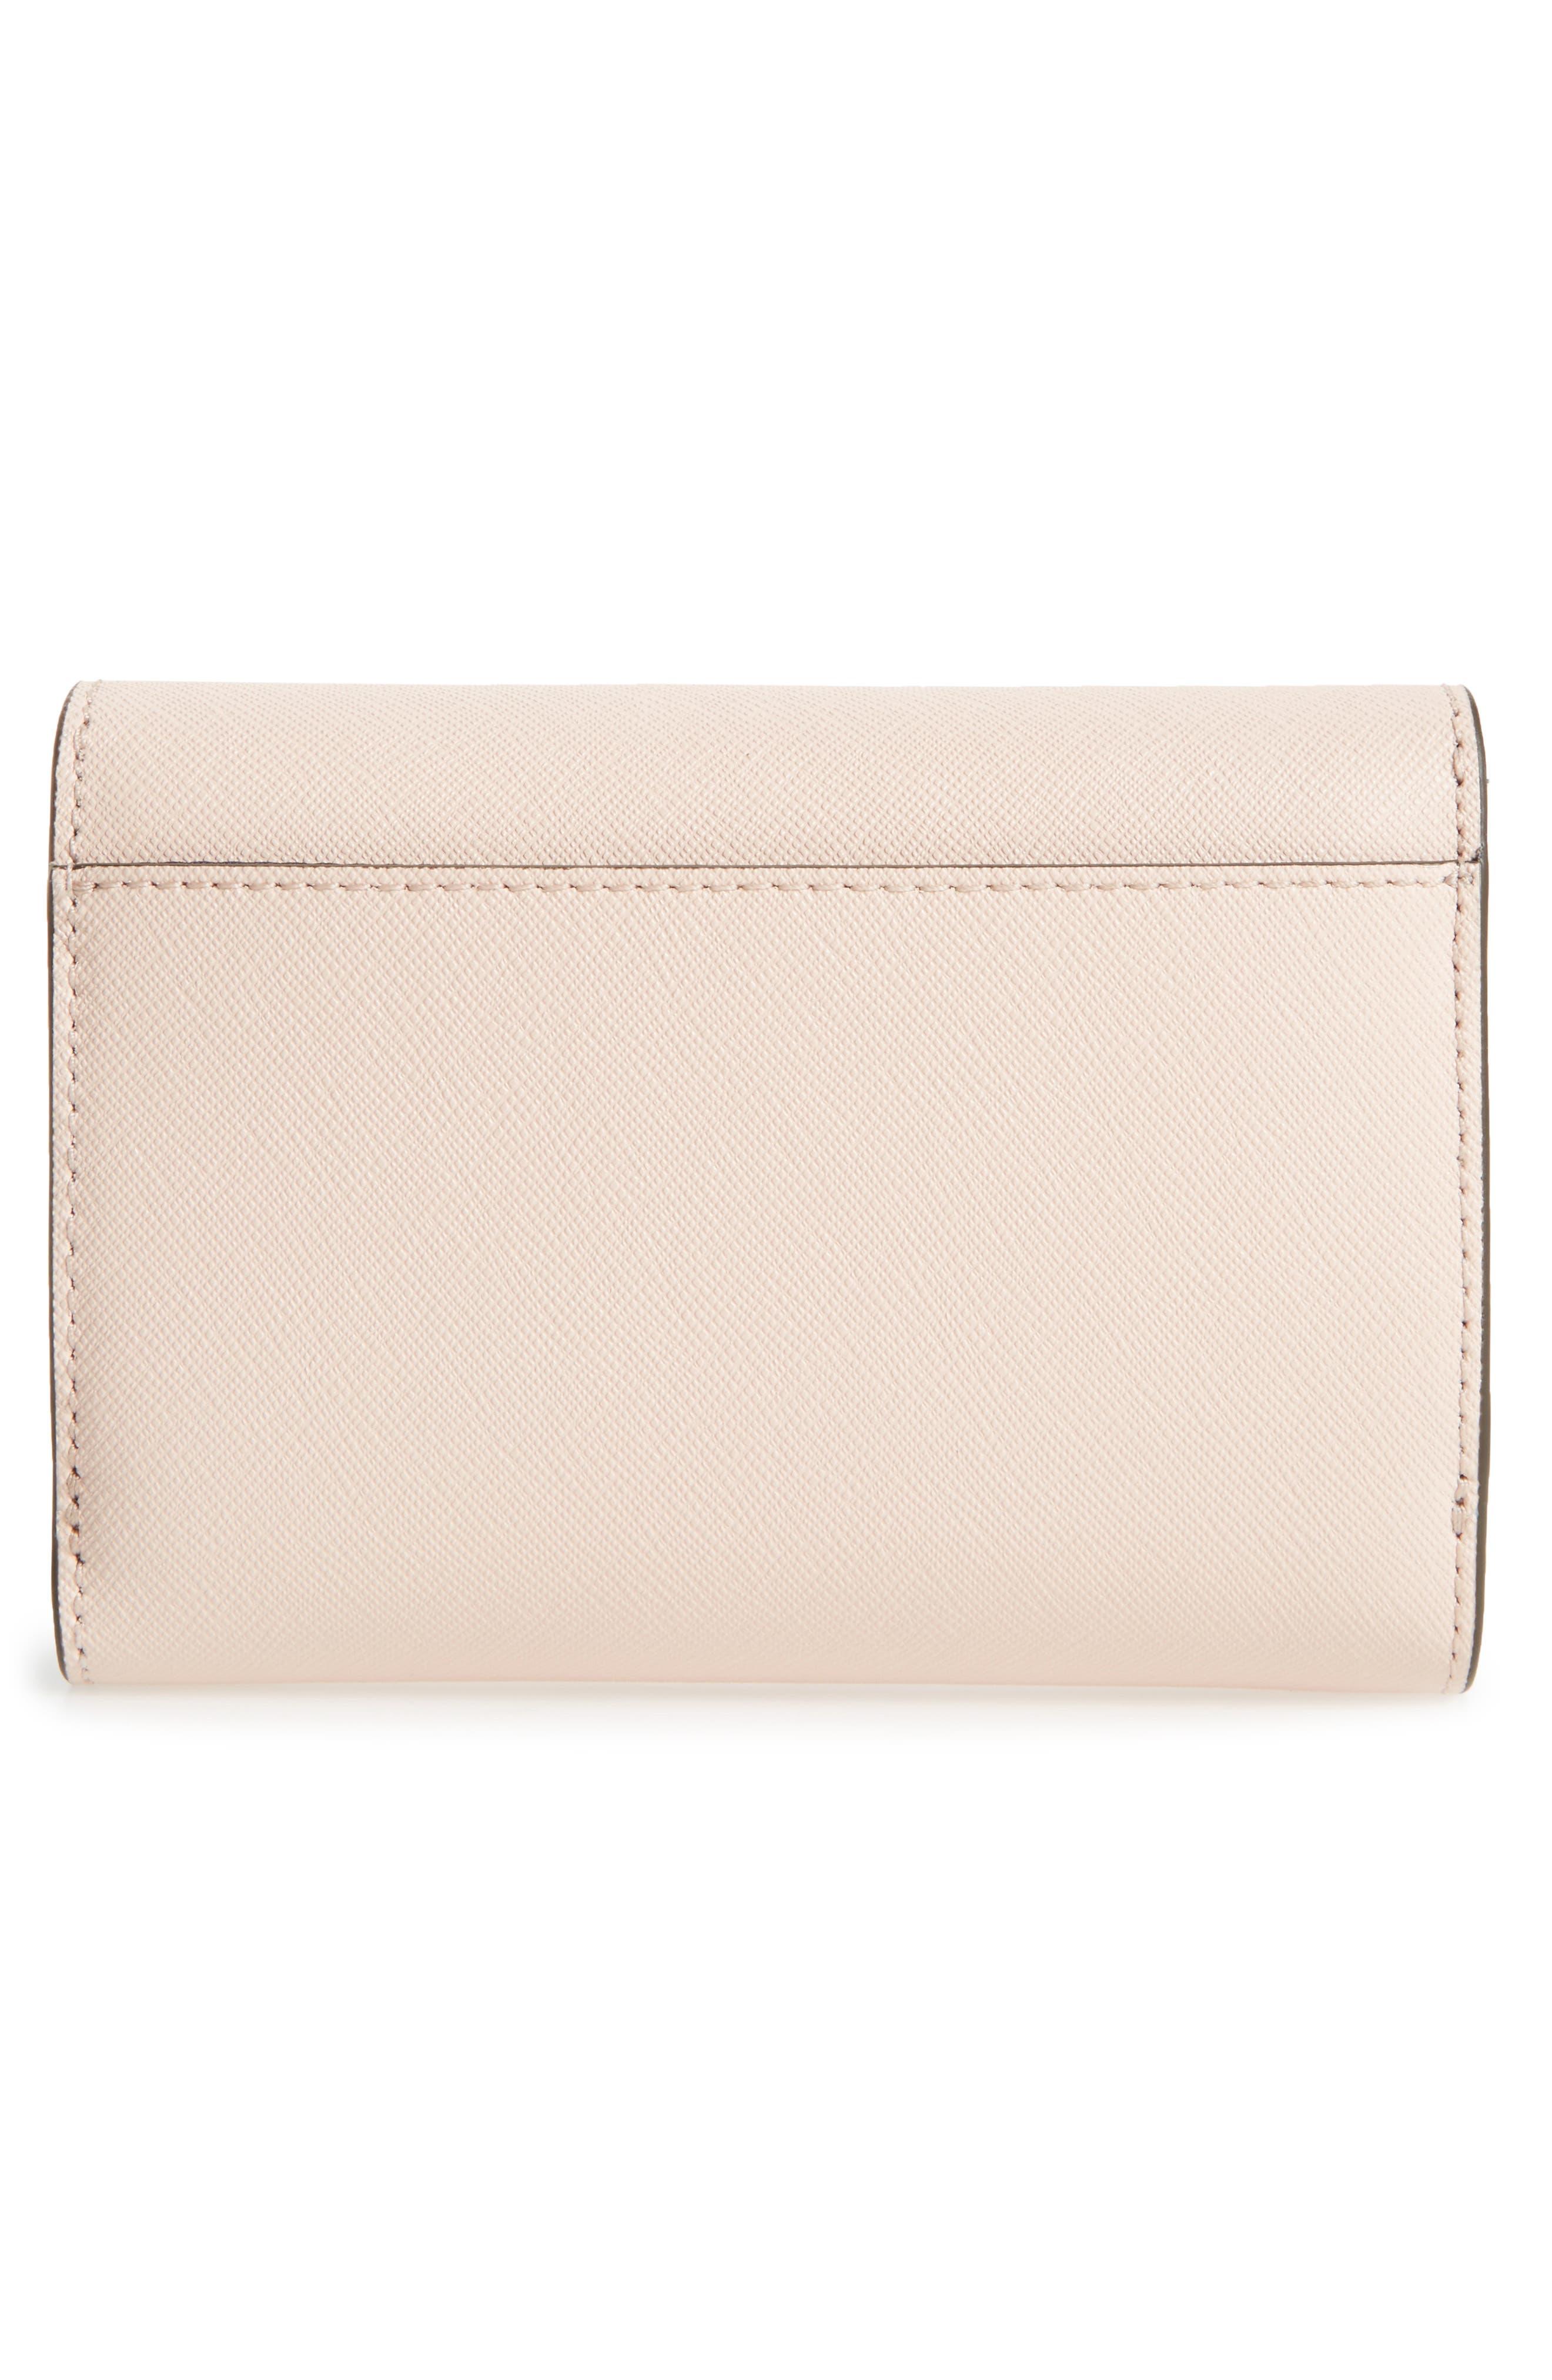 Robinson Medium Leather Wallet,                             Alternate thumbnail 8, color,